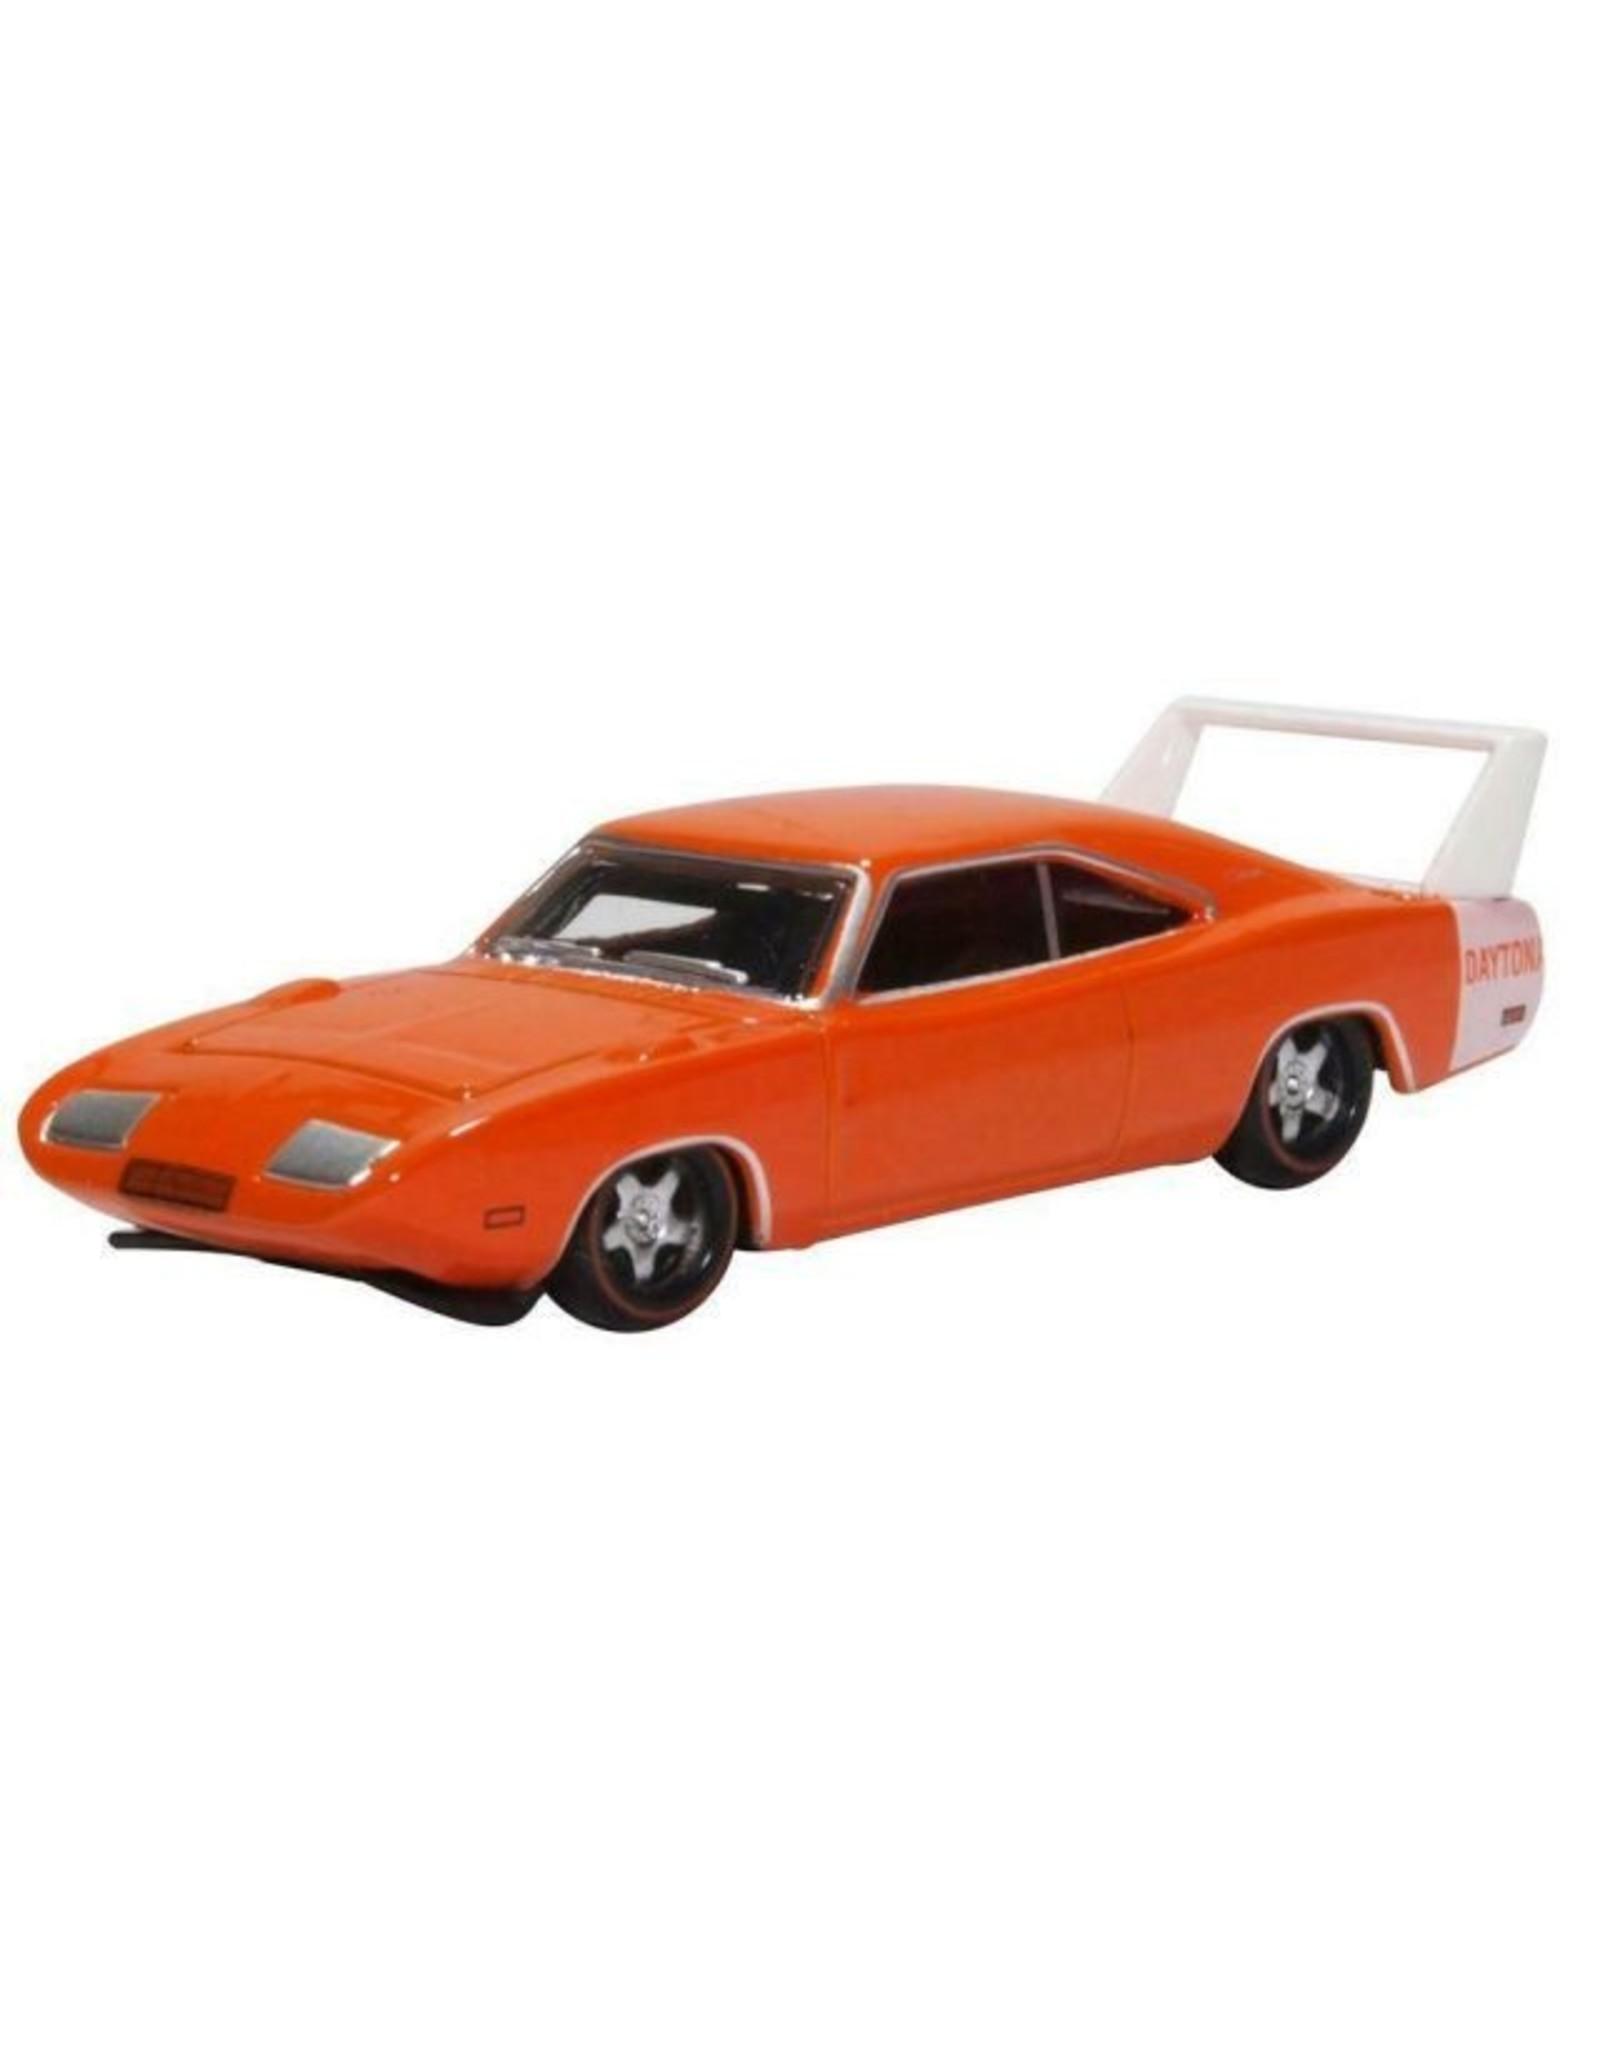 Dodge(Chrysler) DODGE CHARGER DAYTONA-1969(orange/white)